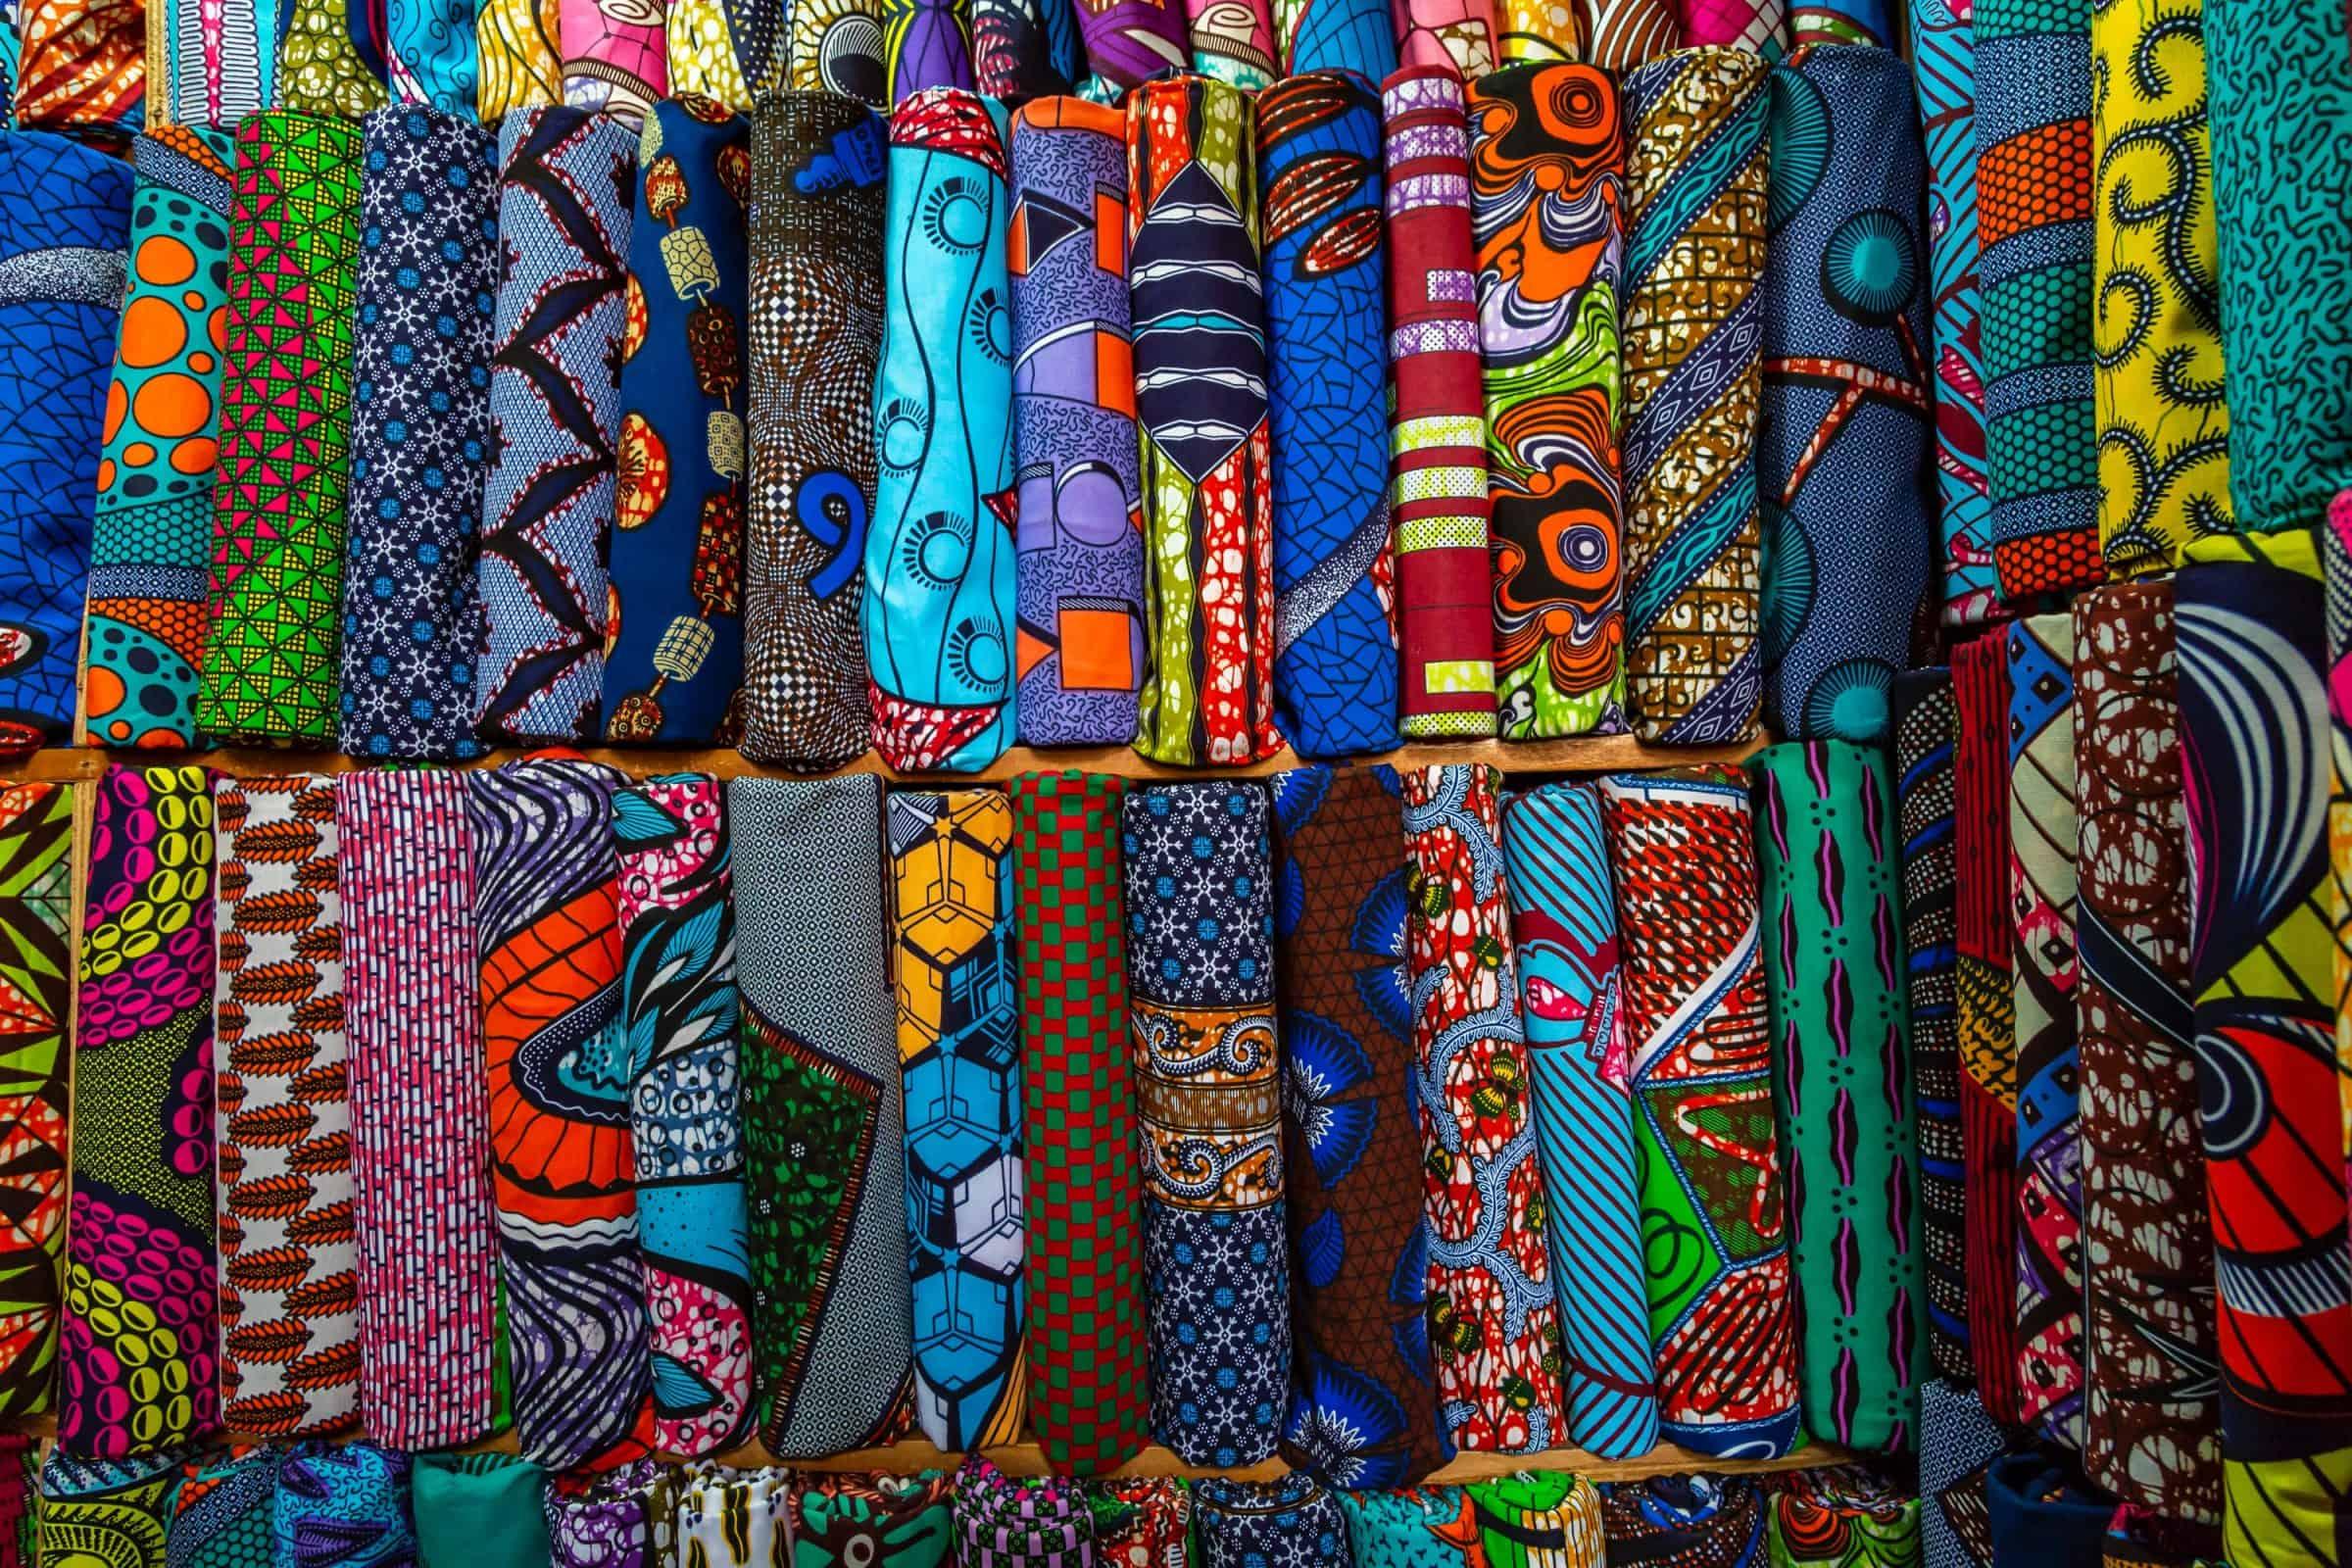 Mozambique colourful textiles